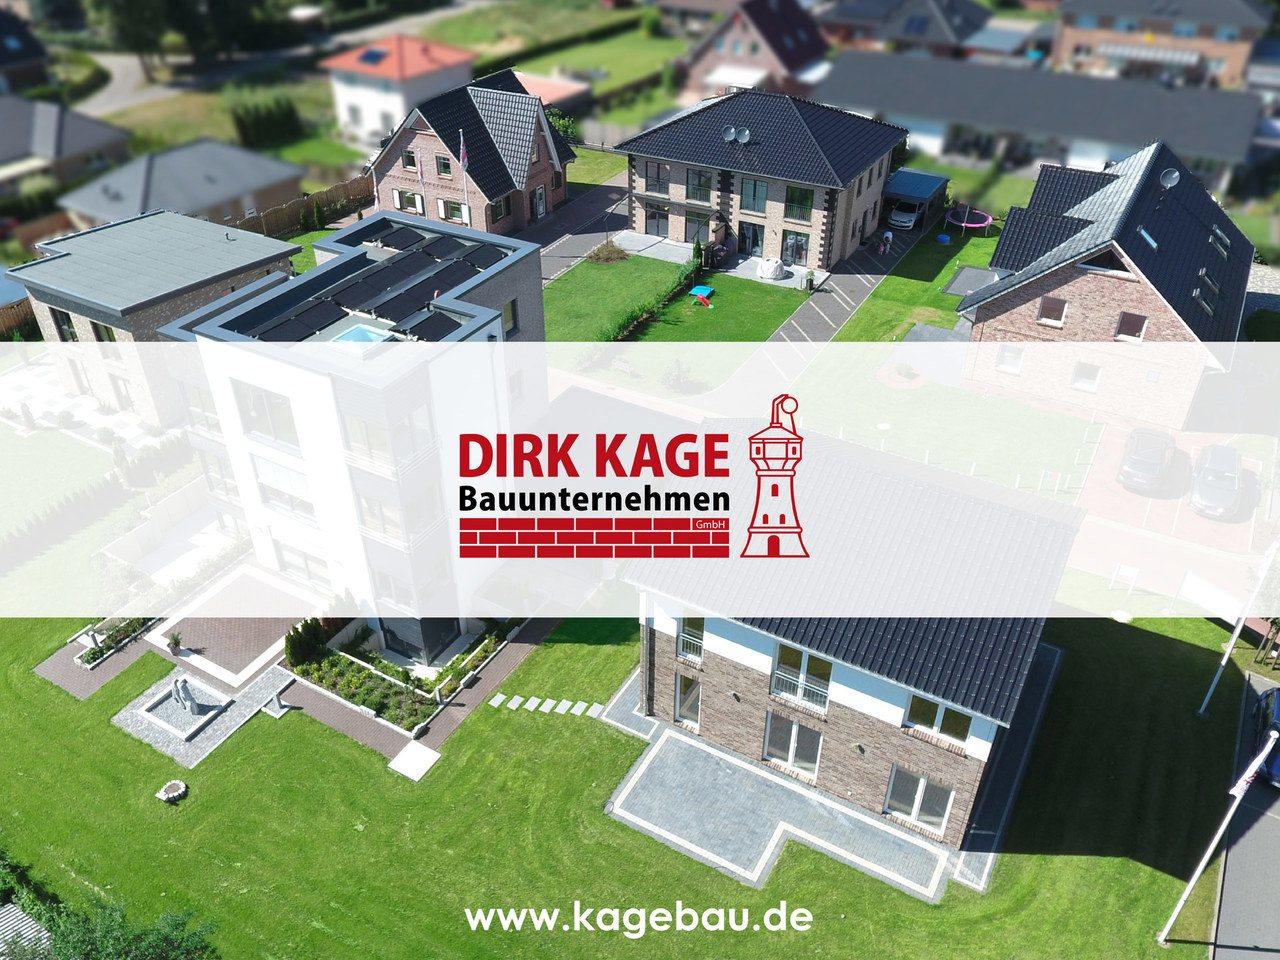 Dirk Kage Bauunternehmen - Imagebild